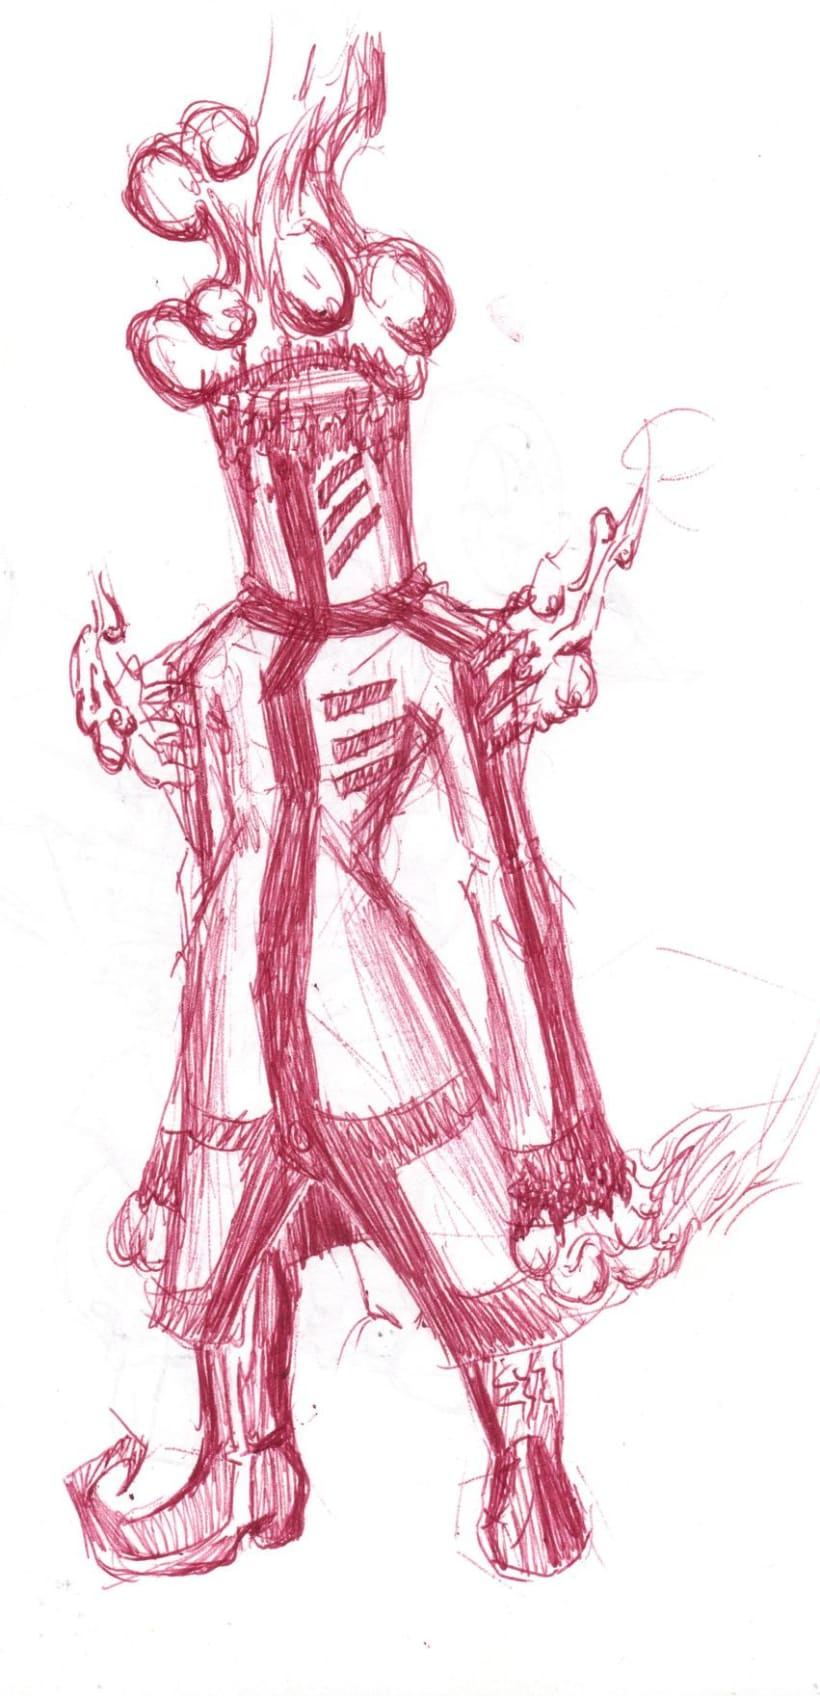 varios dibujos a boli 9